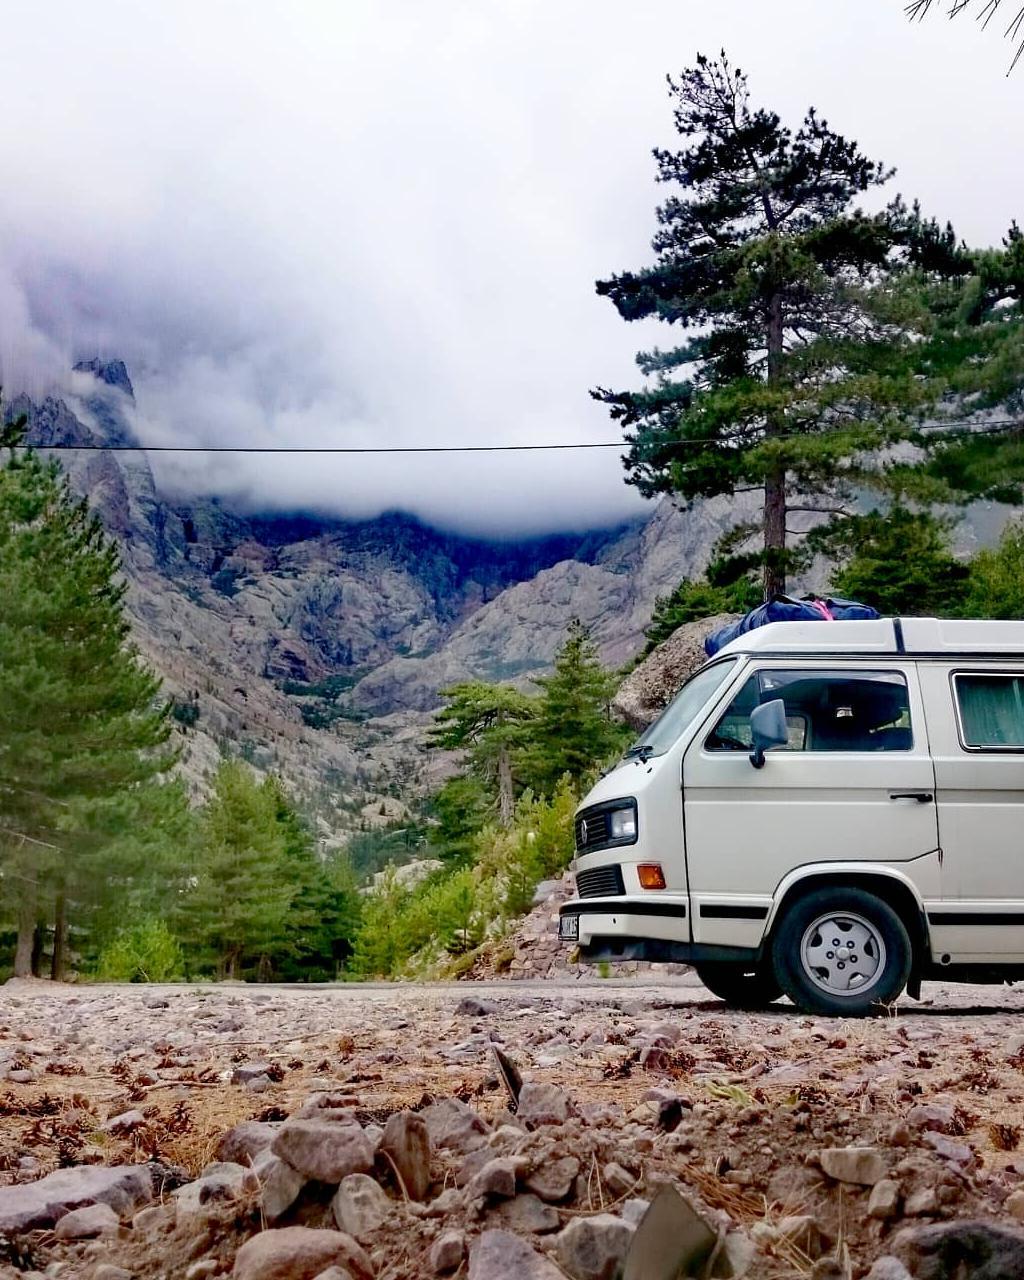 Korsika-Unsere 5 Lieblings-Campingplätze in der Balagne